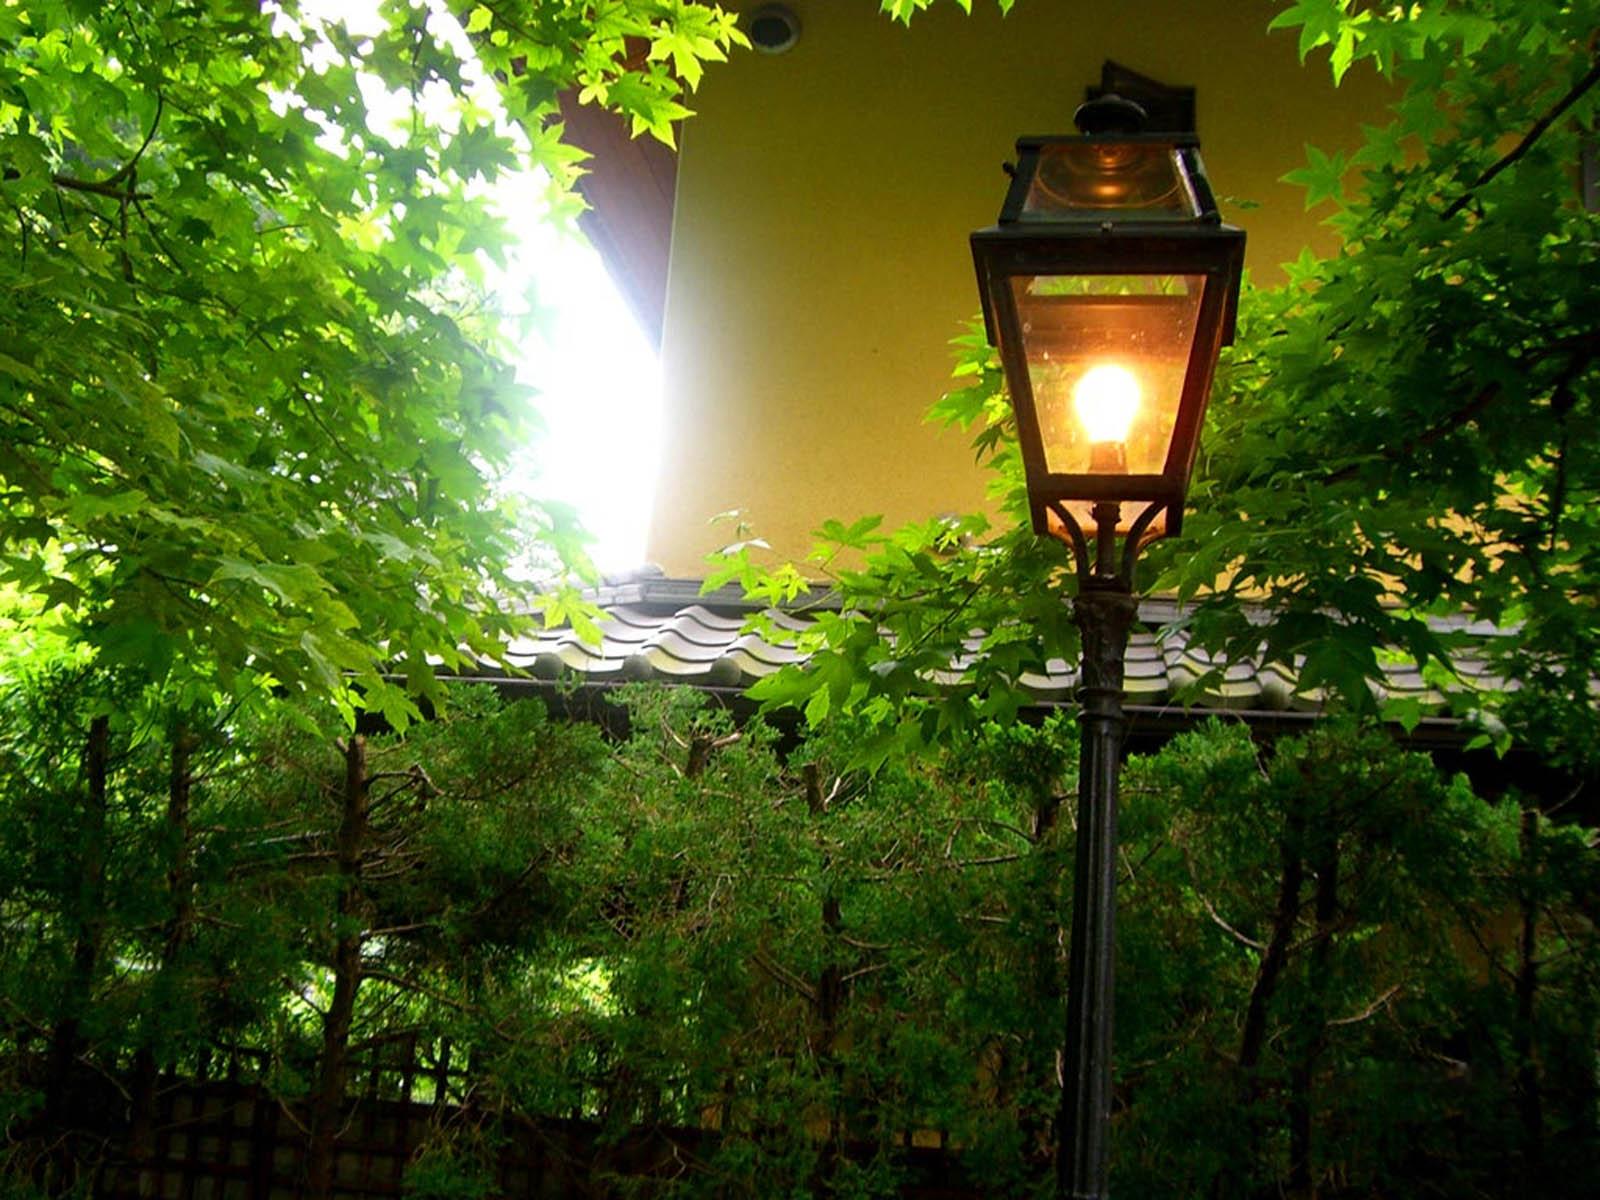 Wallpaper Street Lamps